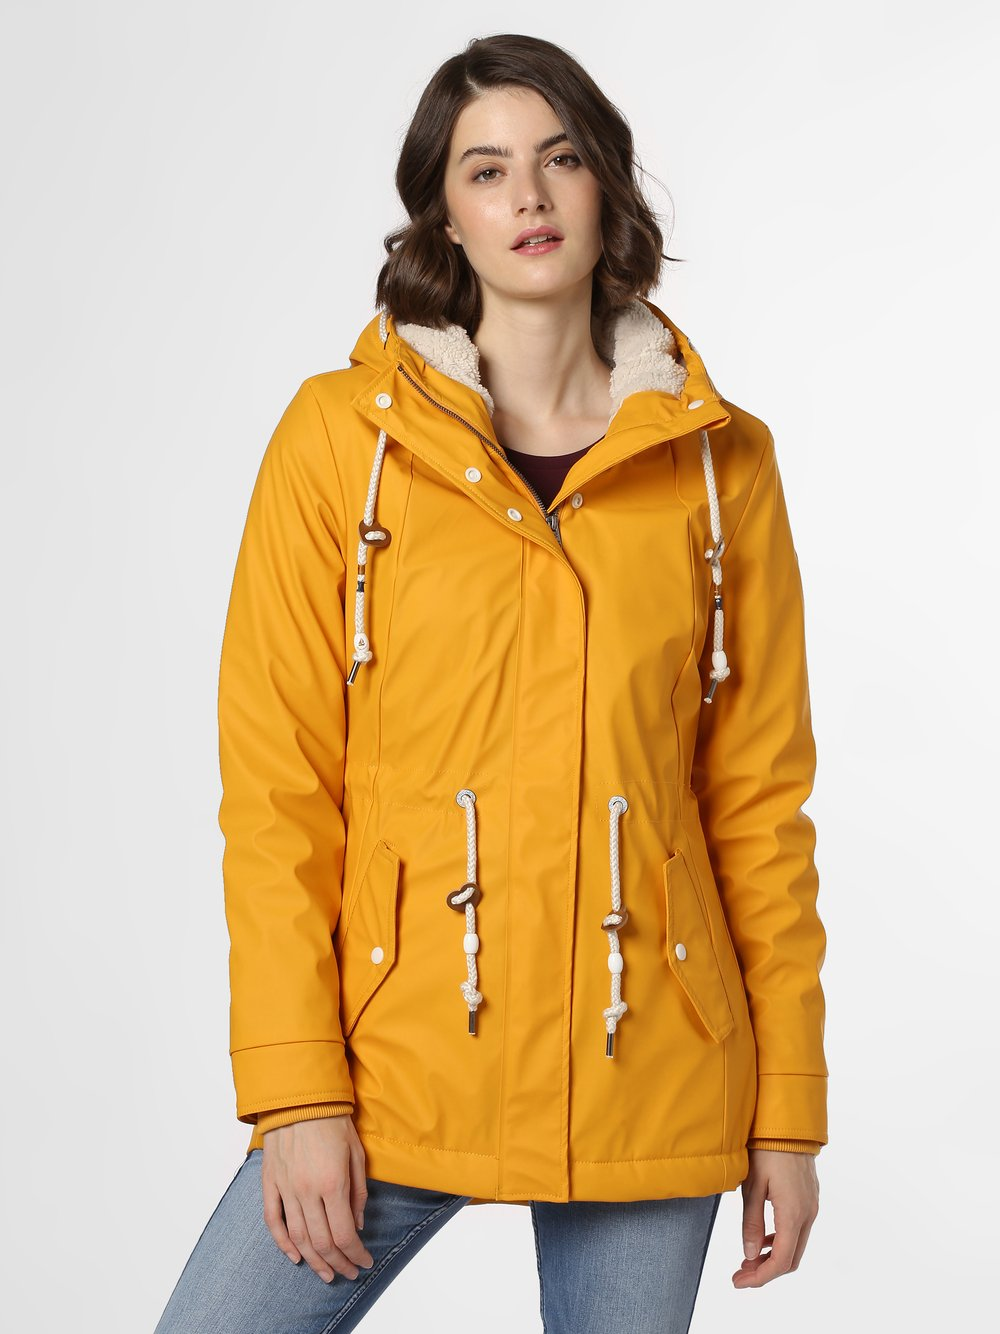 monadis rainy jacke für damen